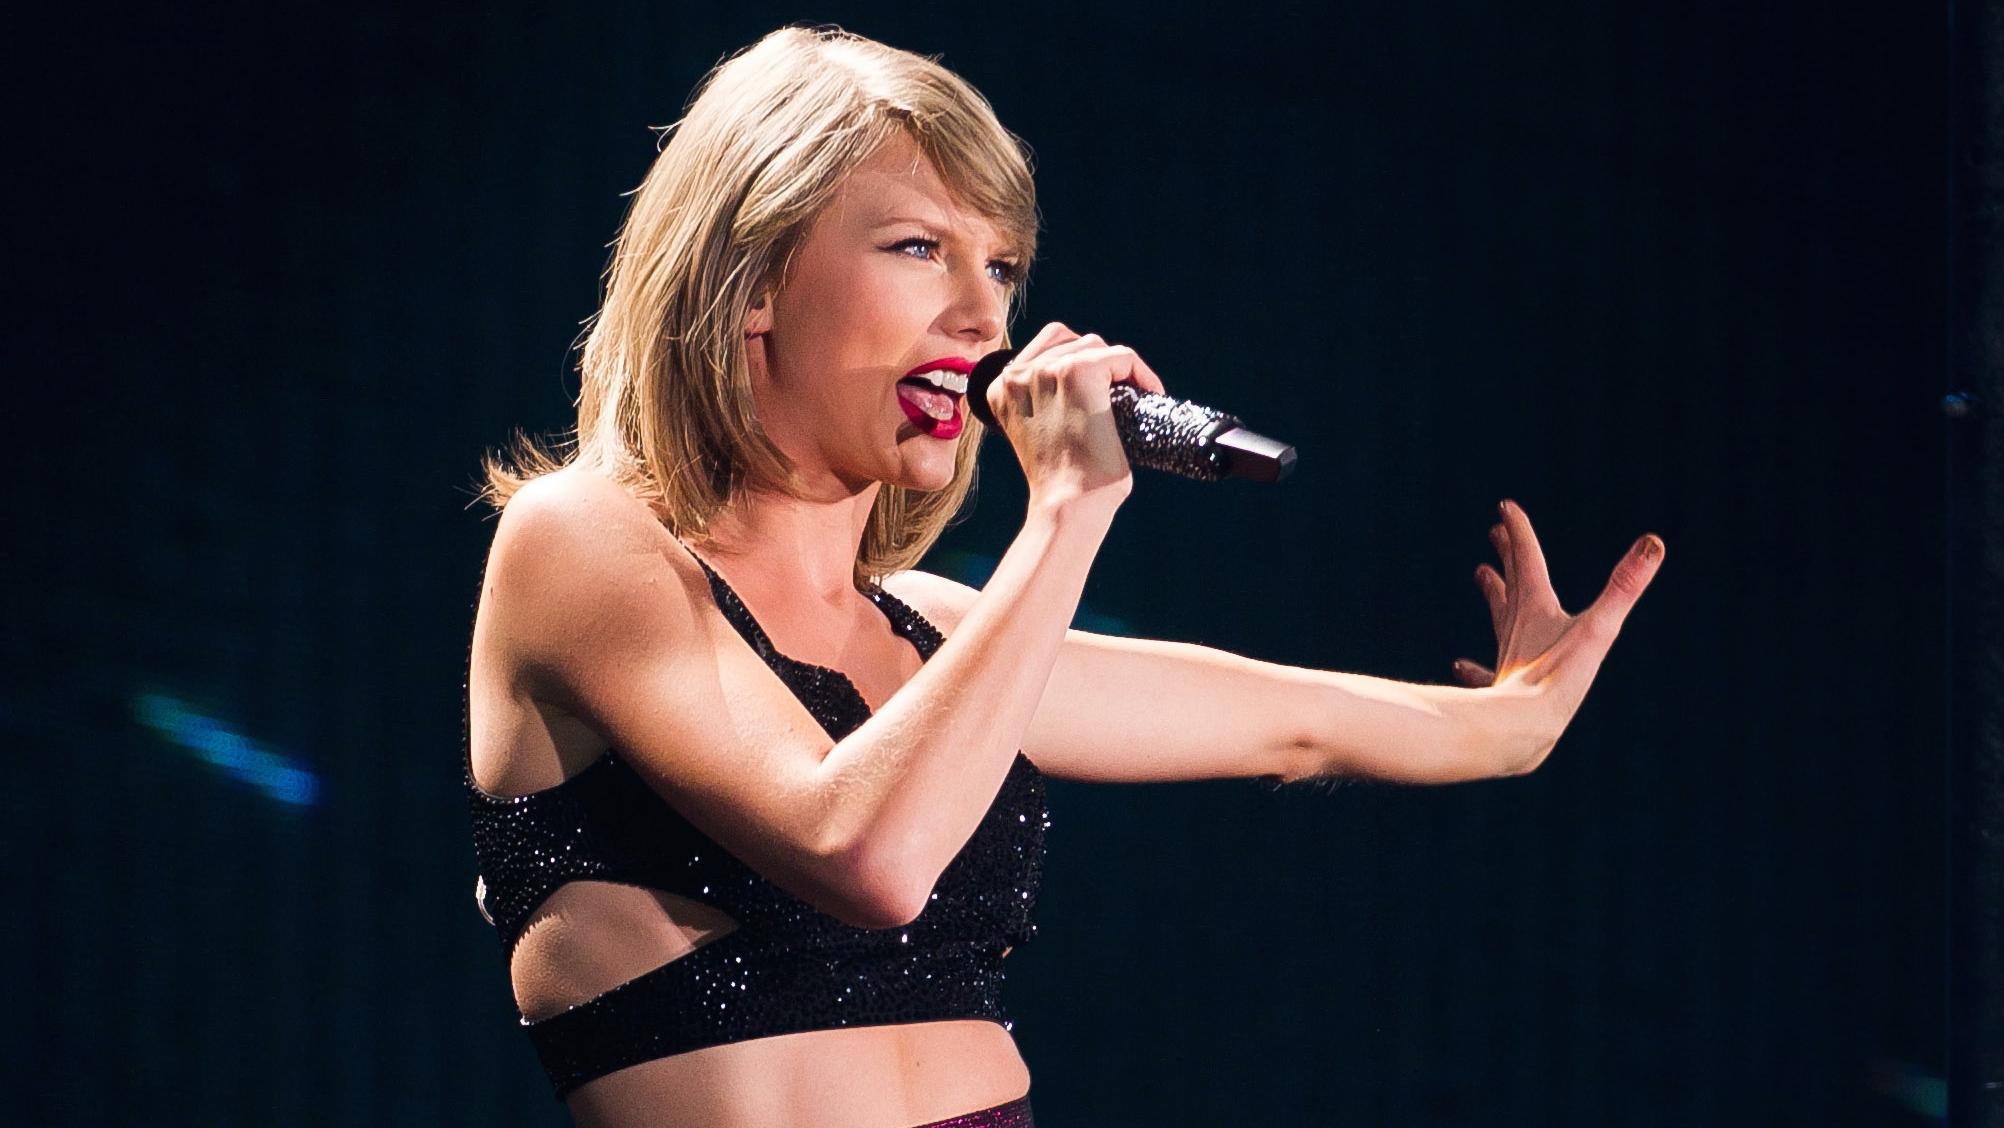 Taylor Swift Performing at MetLife Stadium - H 2015